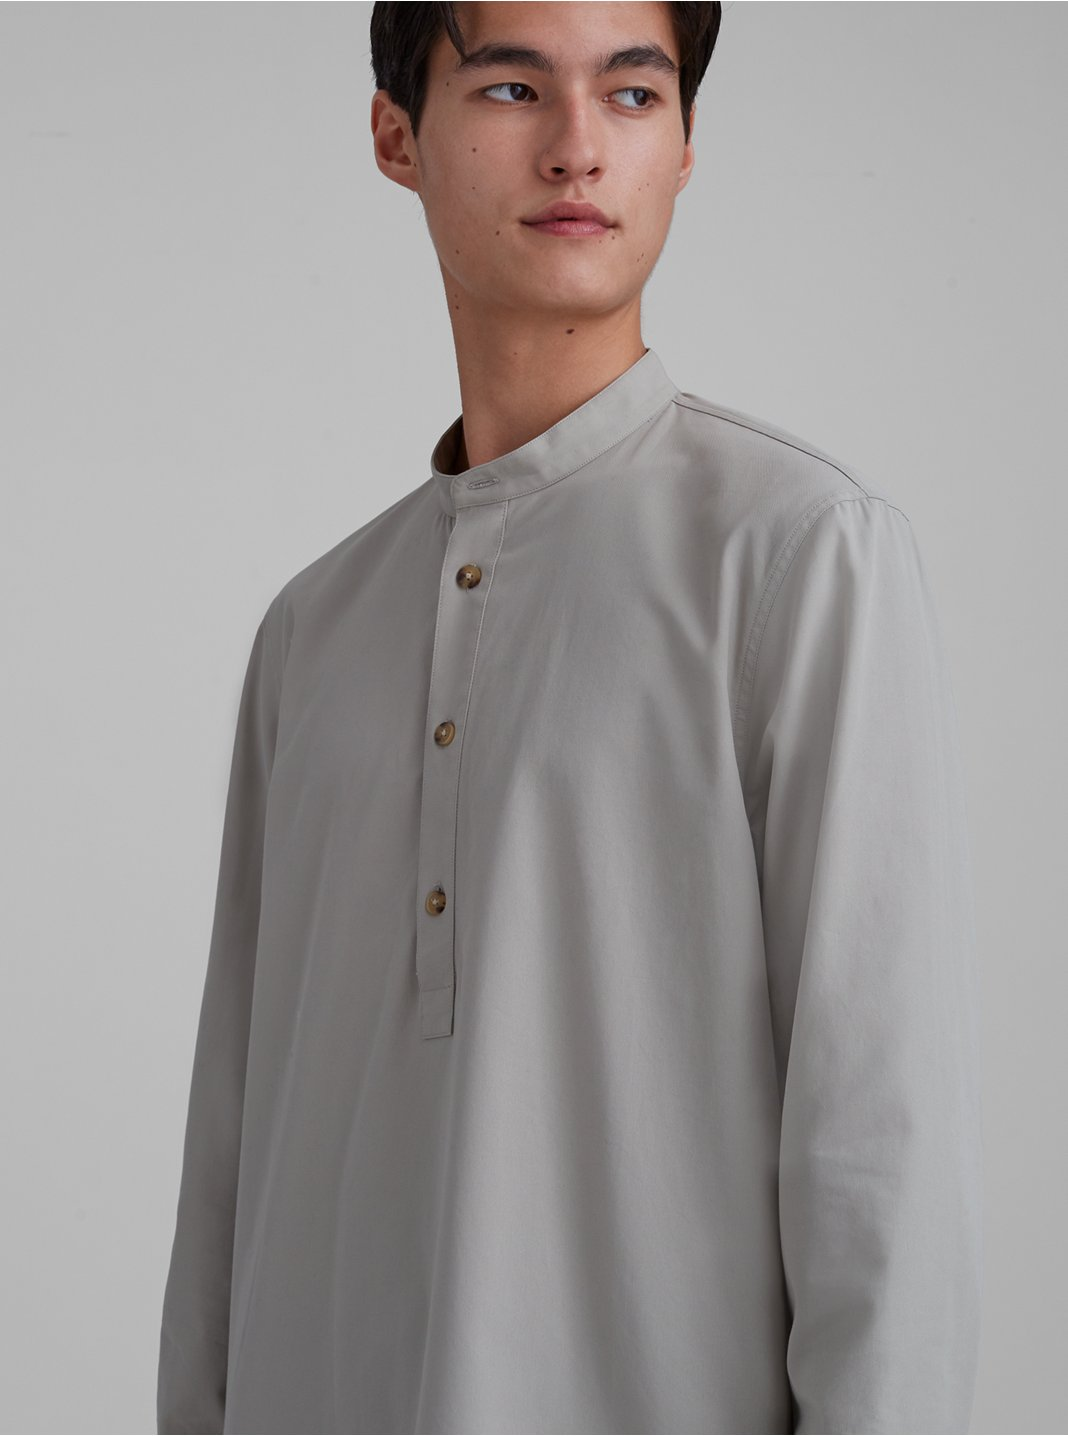 Band Collar Popover Shirt